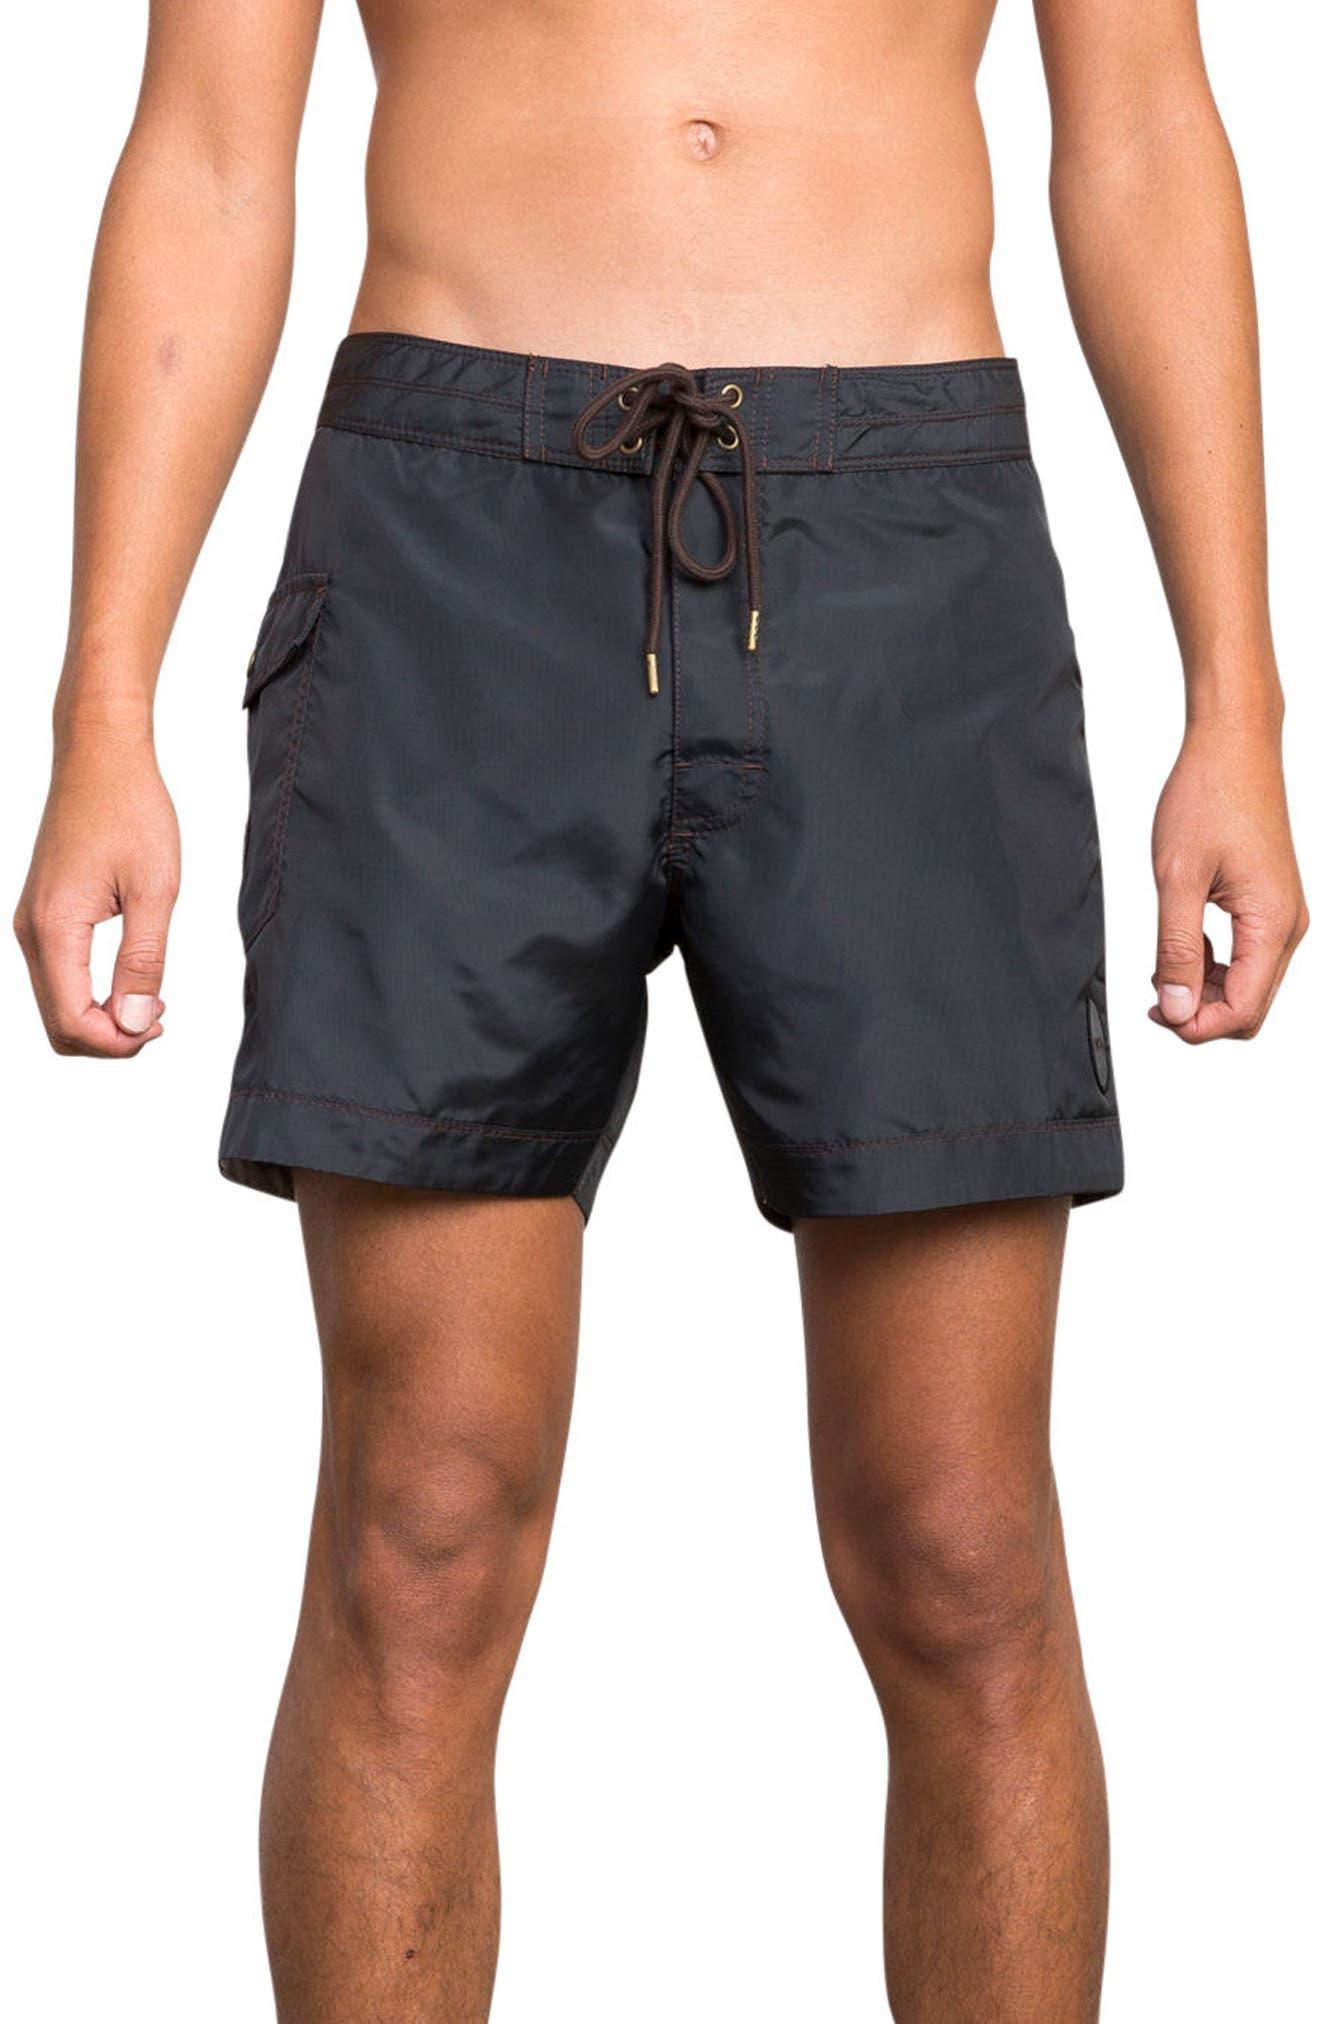 Knost Swim Trunks,                         Main,                         color, Rvca Black